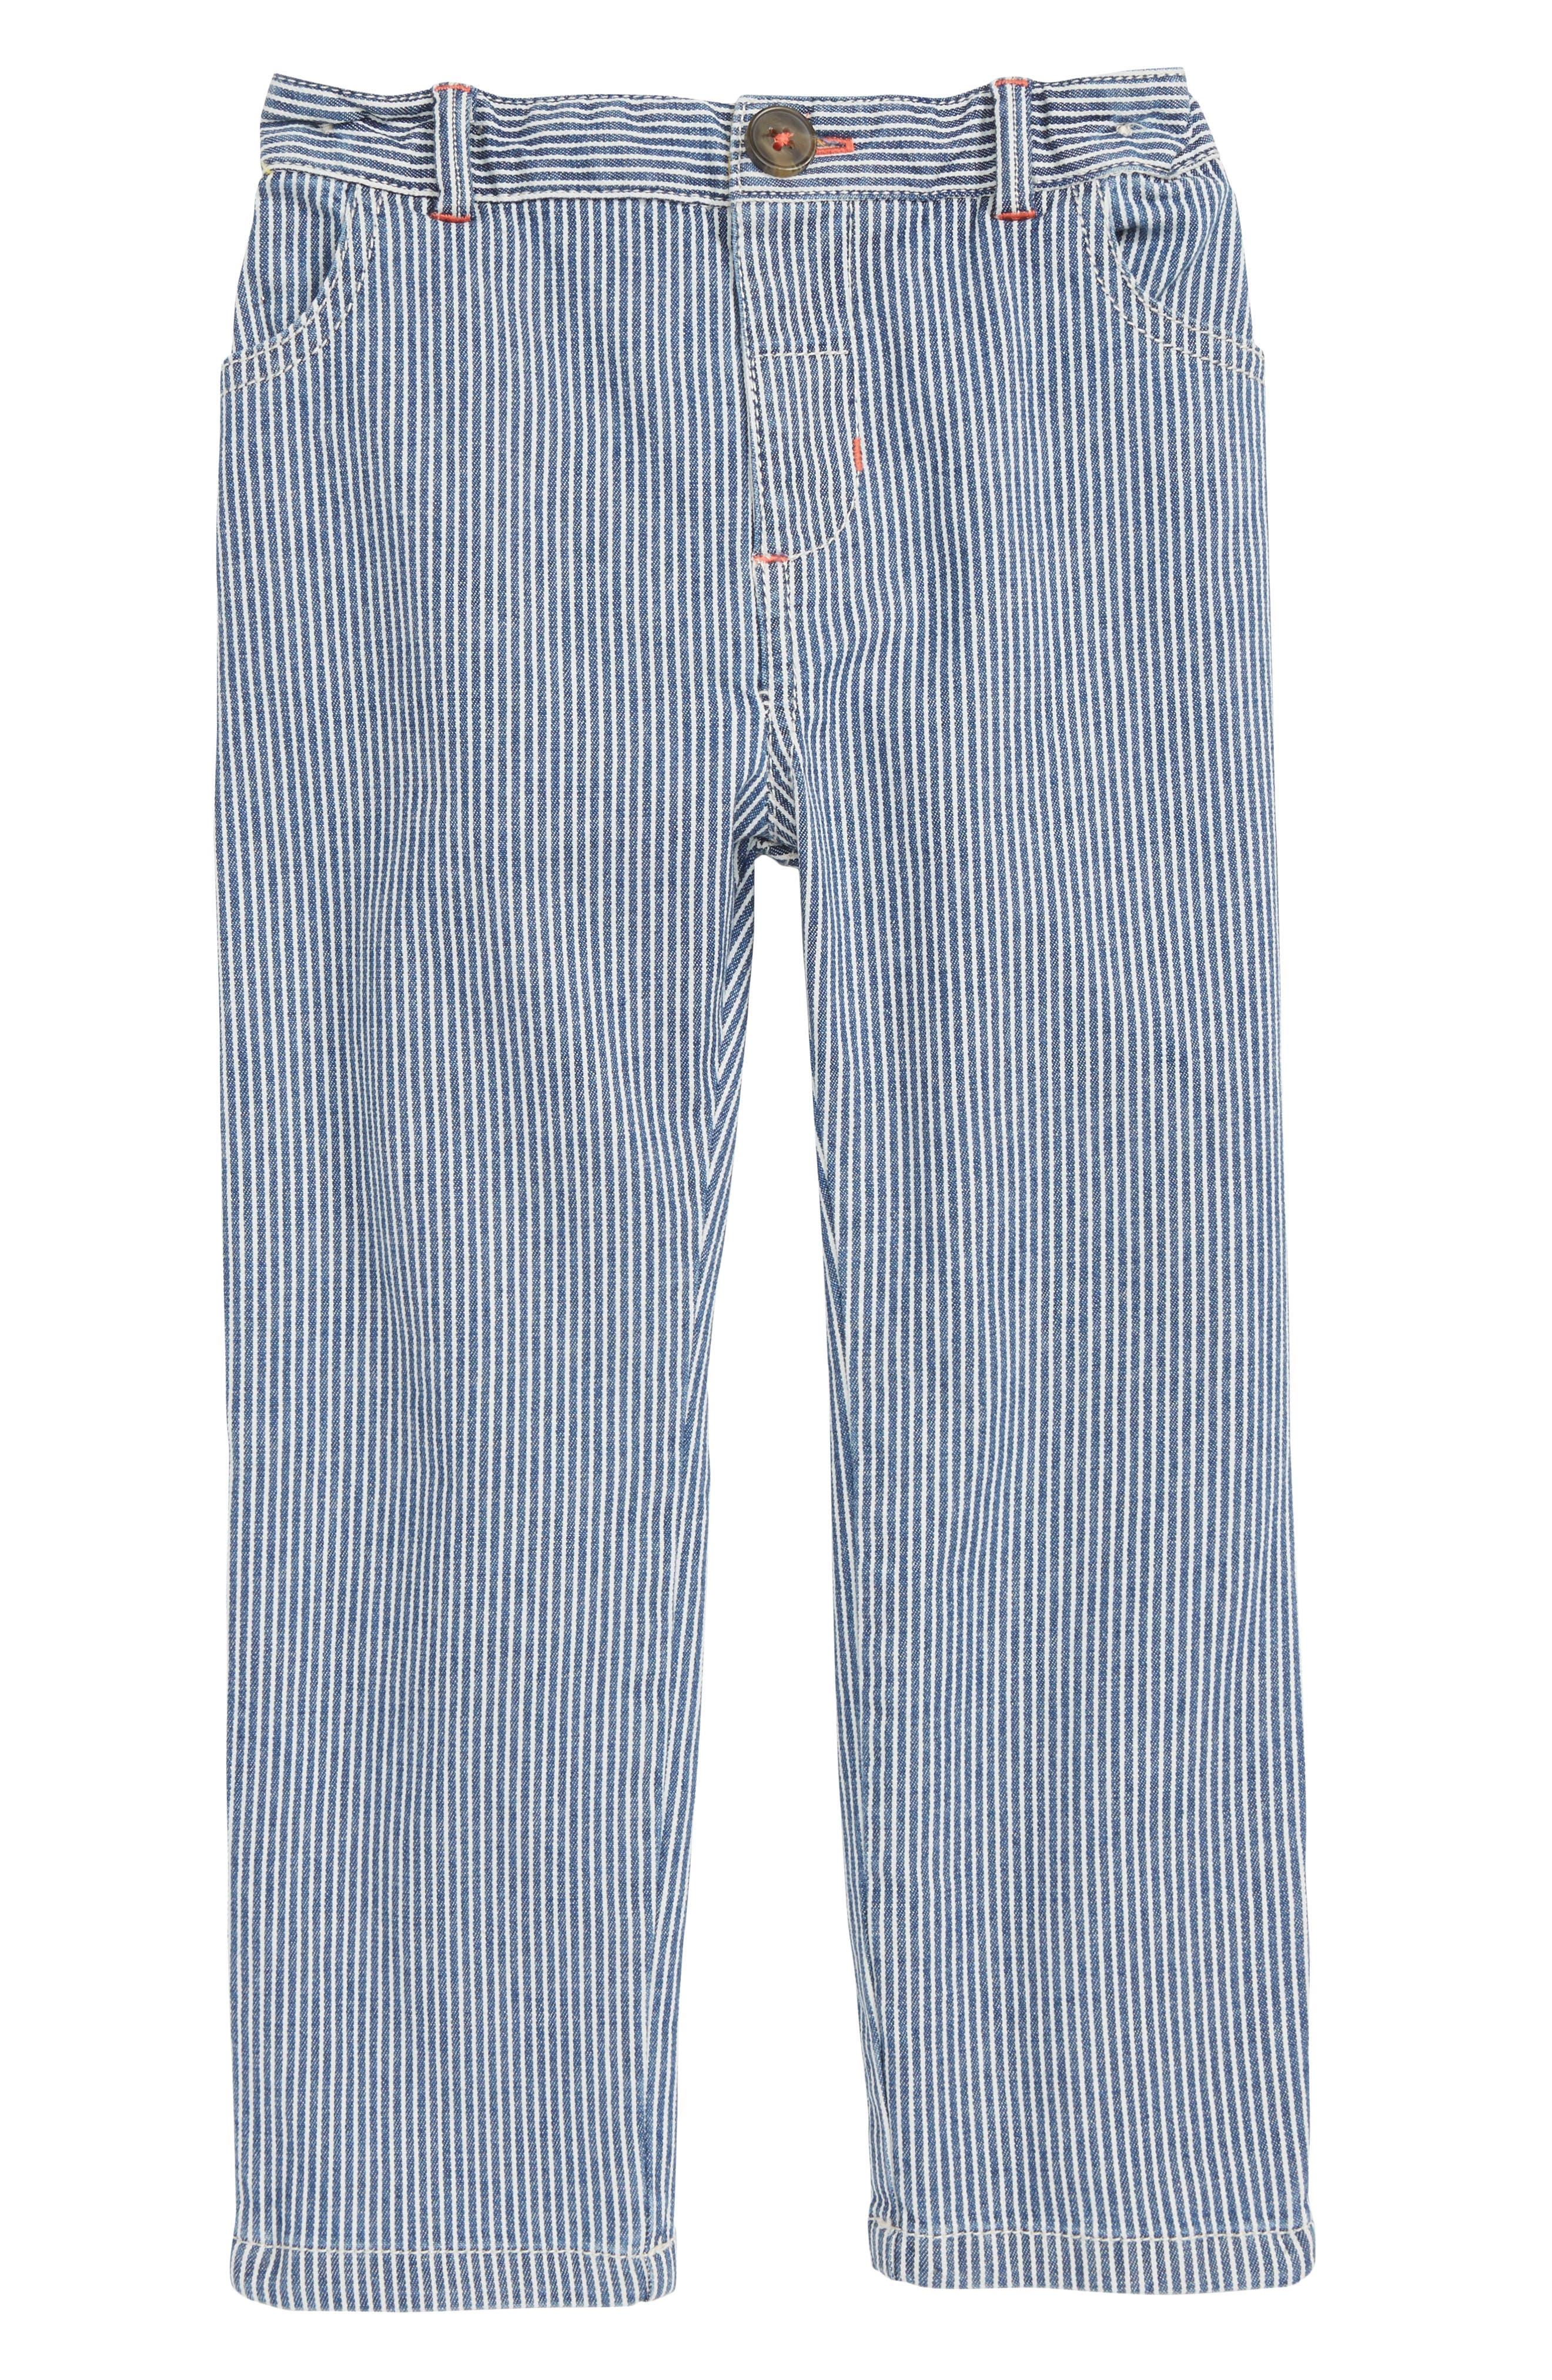 Ticking Stripe Chino Pants,                             Main thumbnail 1, color,                             BLU DUKE BLUE TICKING